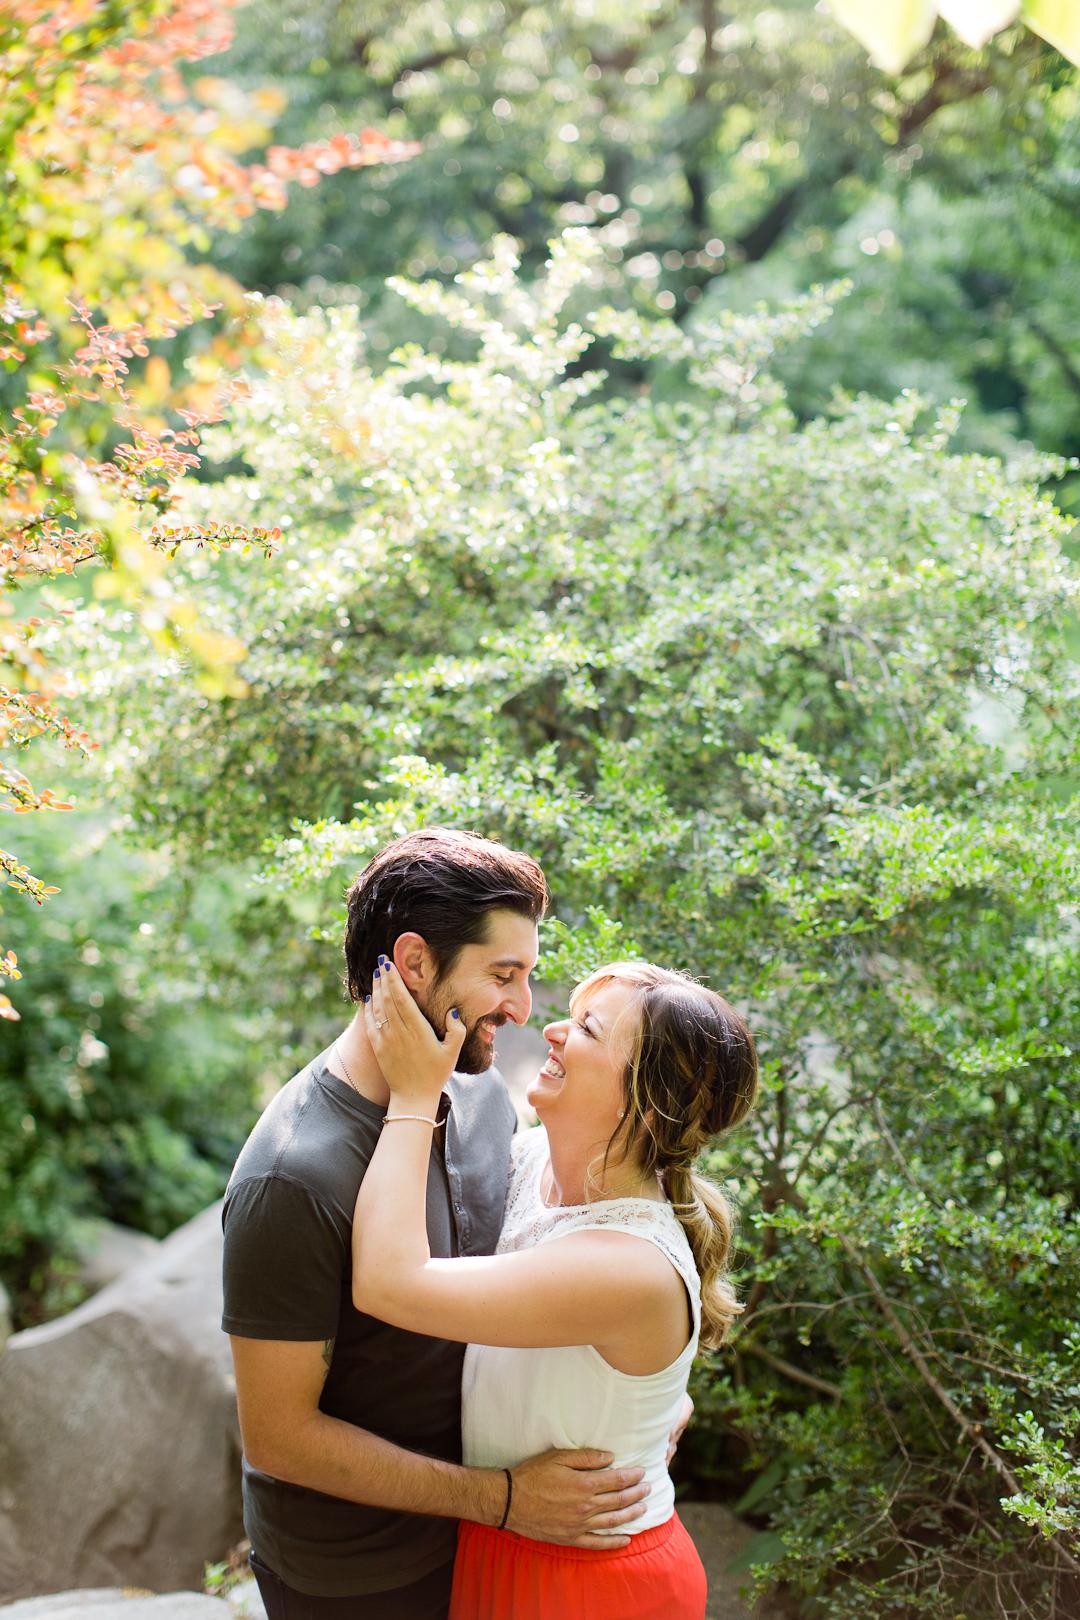 Melissa Kruse Photography - Eileen & Kenny Engagement Photos-55.jpg